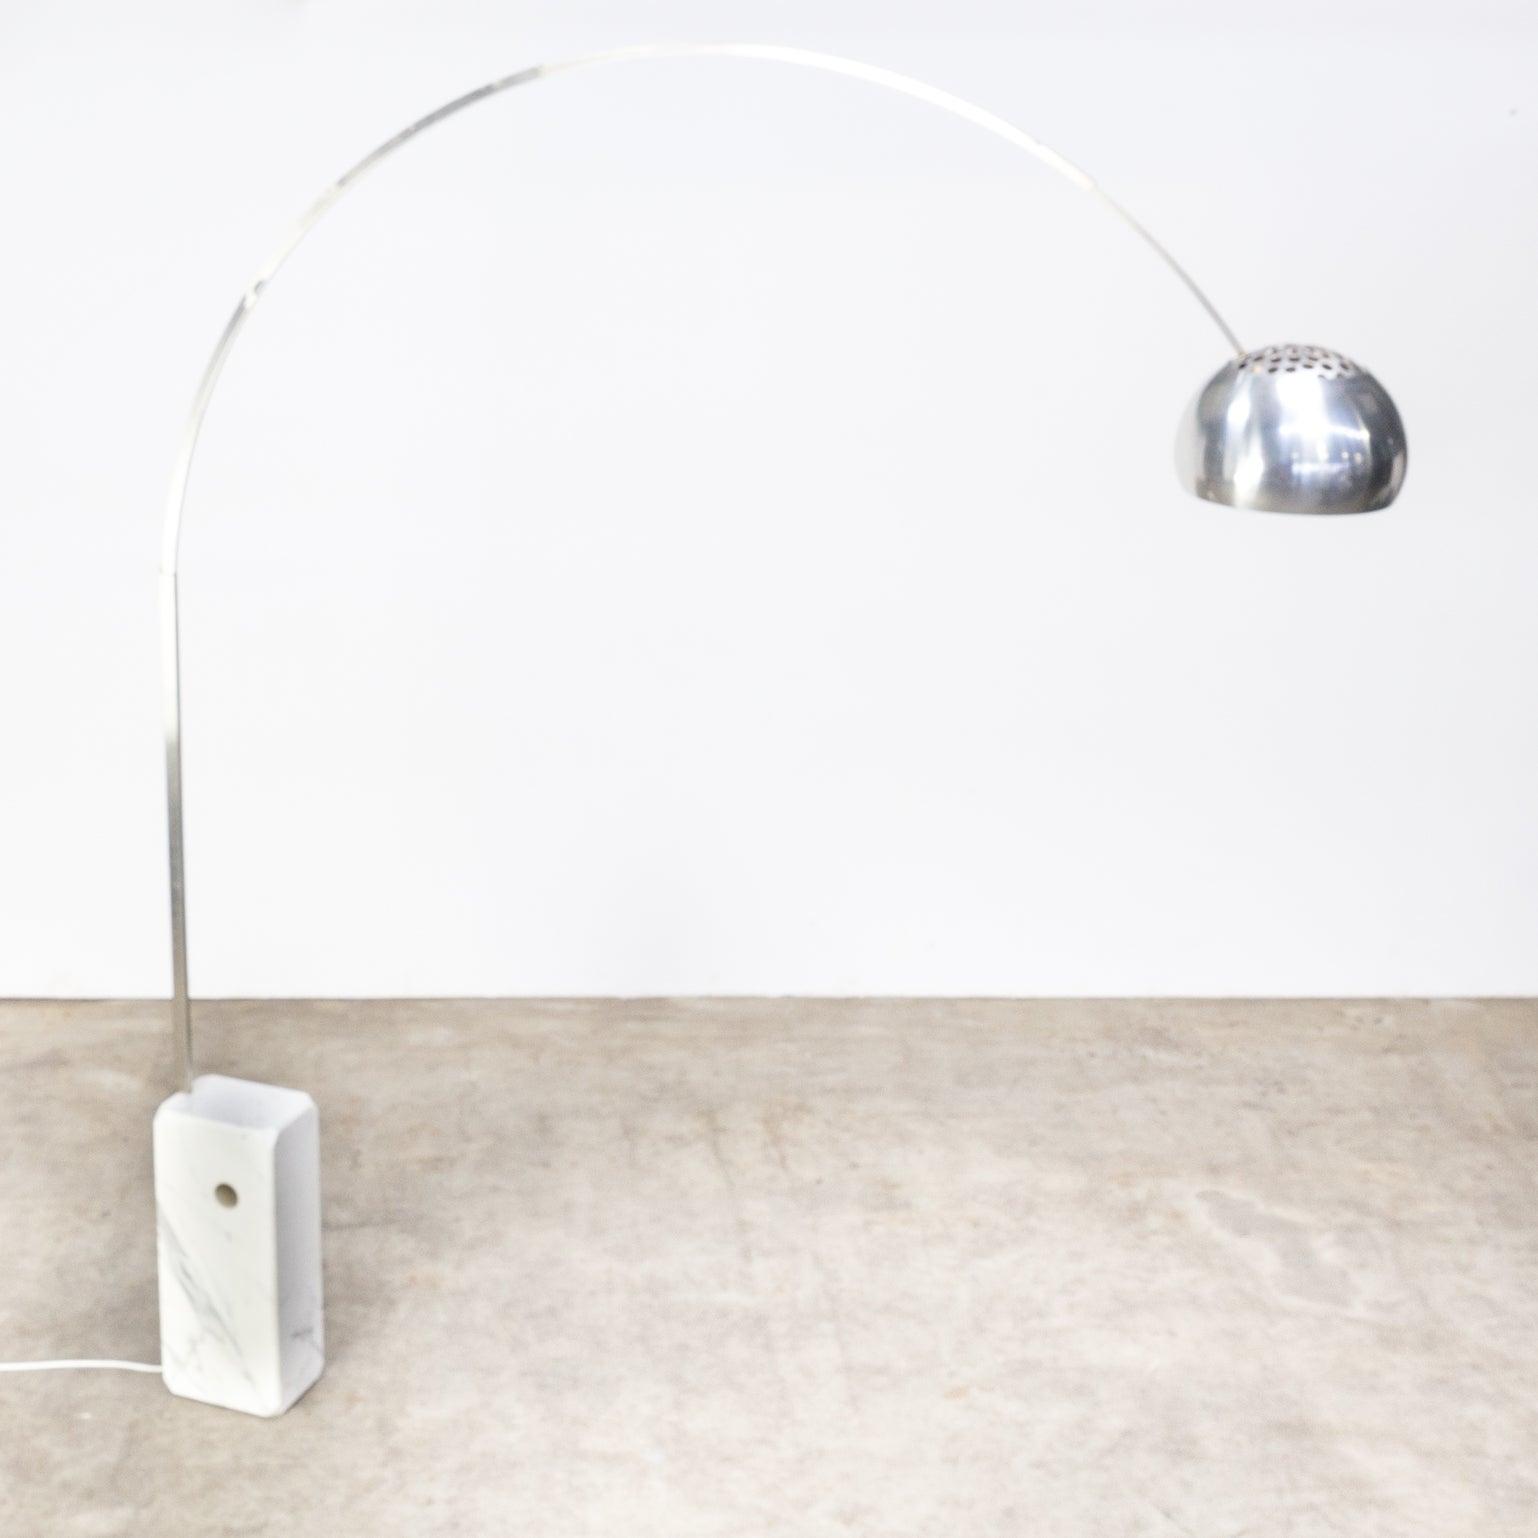 Verwonderlijk 1960s Achille Castiglioni 'Arco' Floor Lamp for Flos For Sale at HJ-97